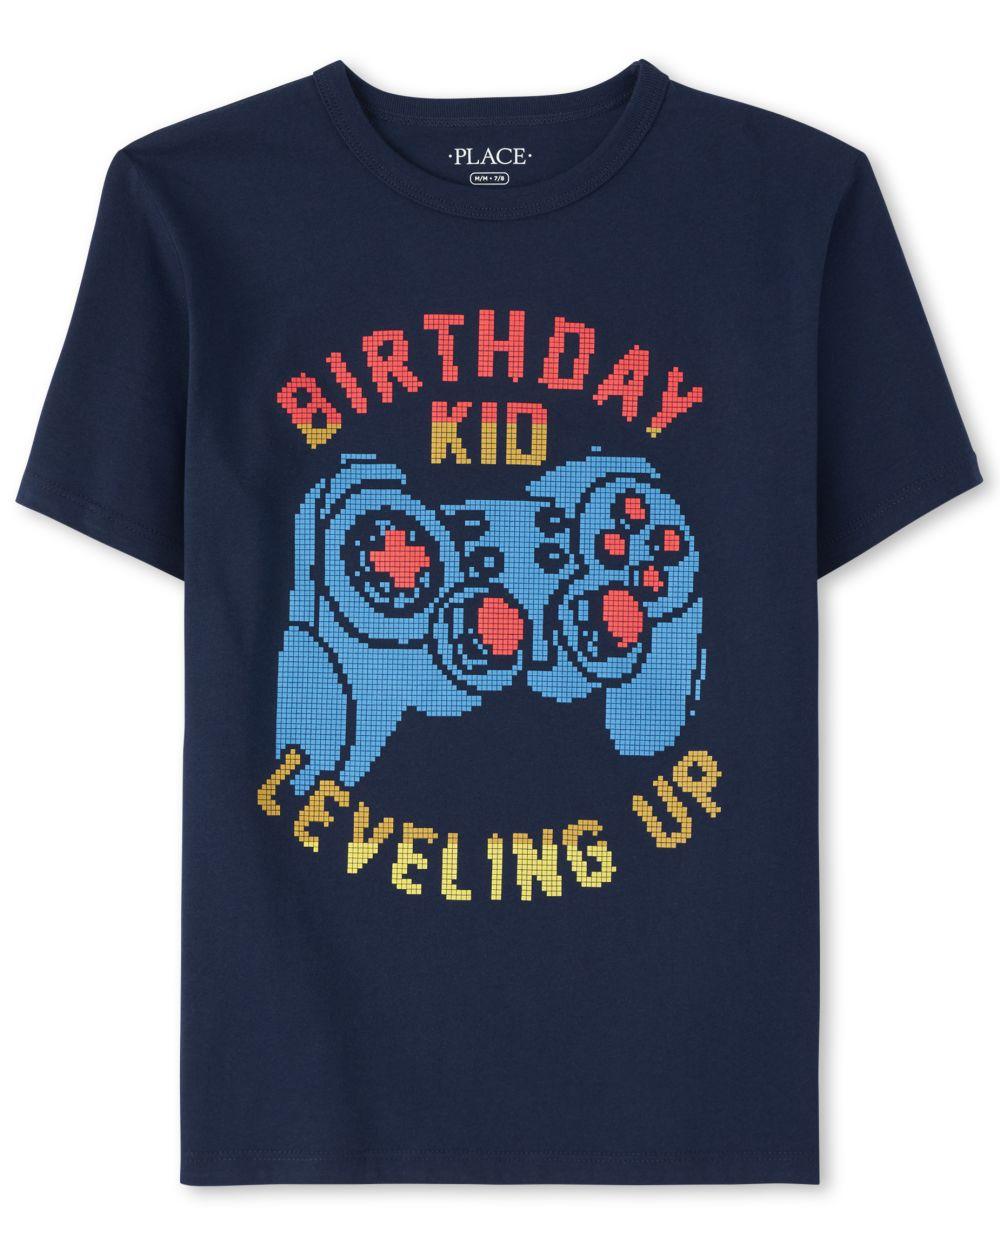 Boys Birthday Video Game Graphic Tee - Blue T-Shirt